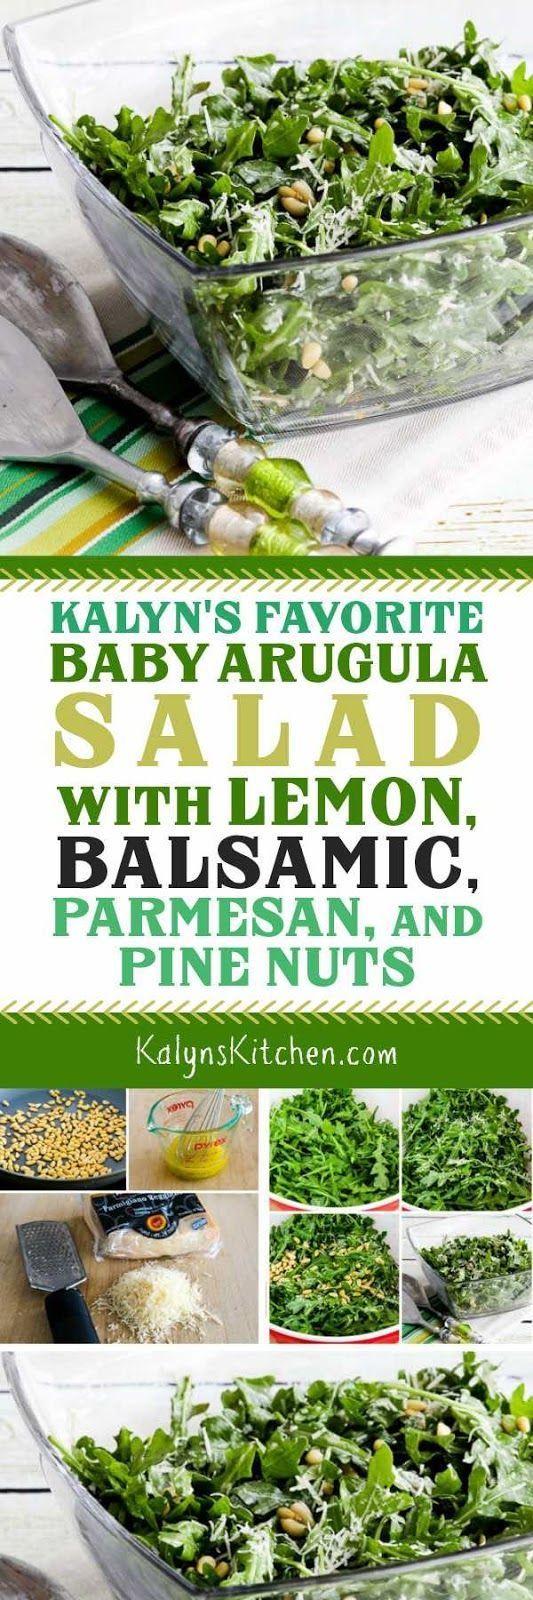 Kalyn's Favorite Baby Arugula Salad with Lemon, Balsamic, Parmesan, and Pine Nuts